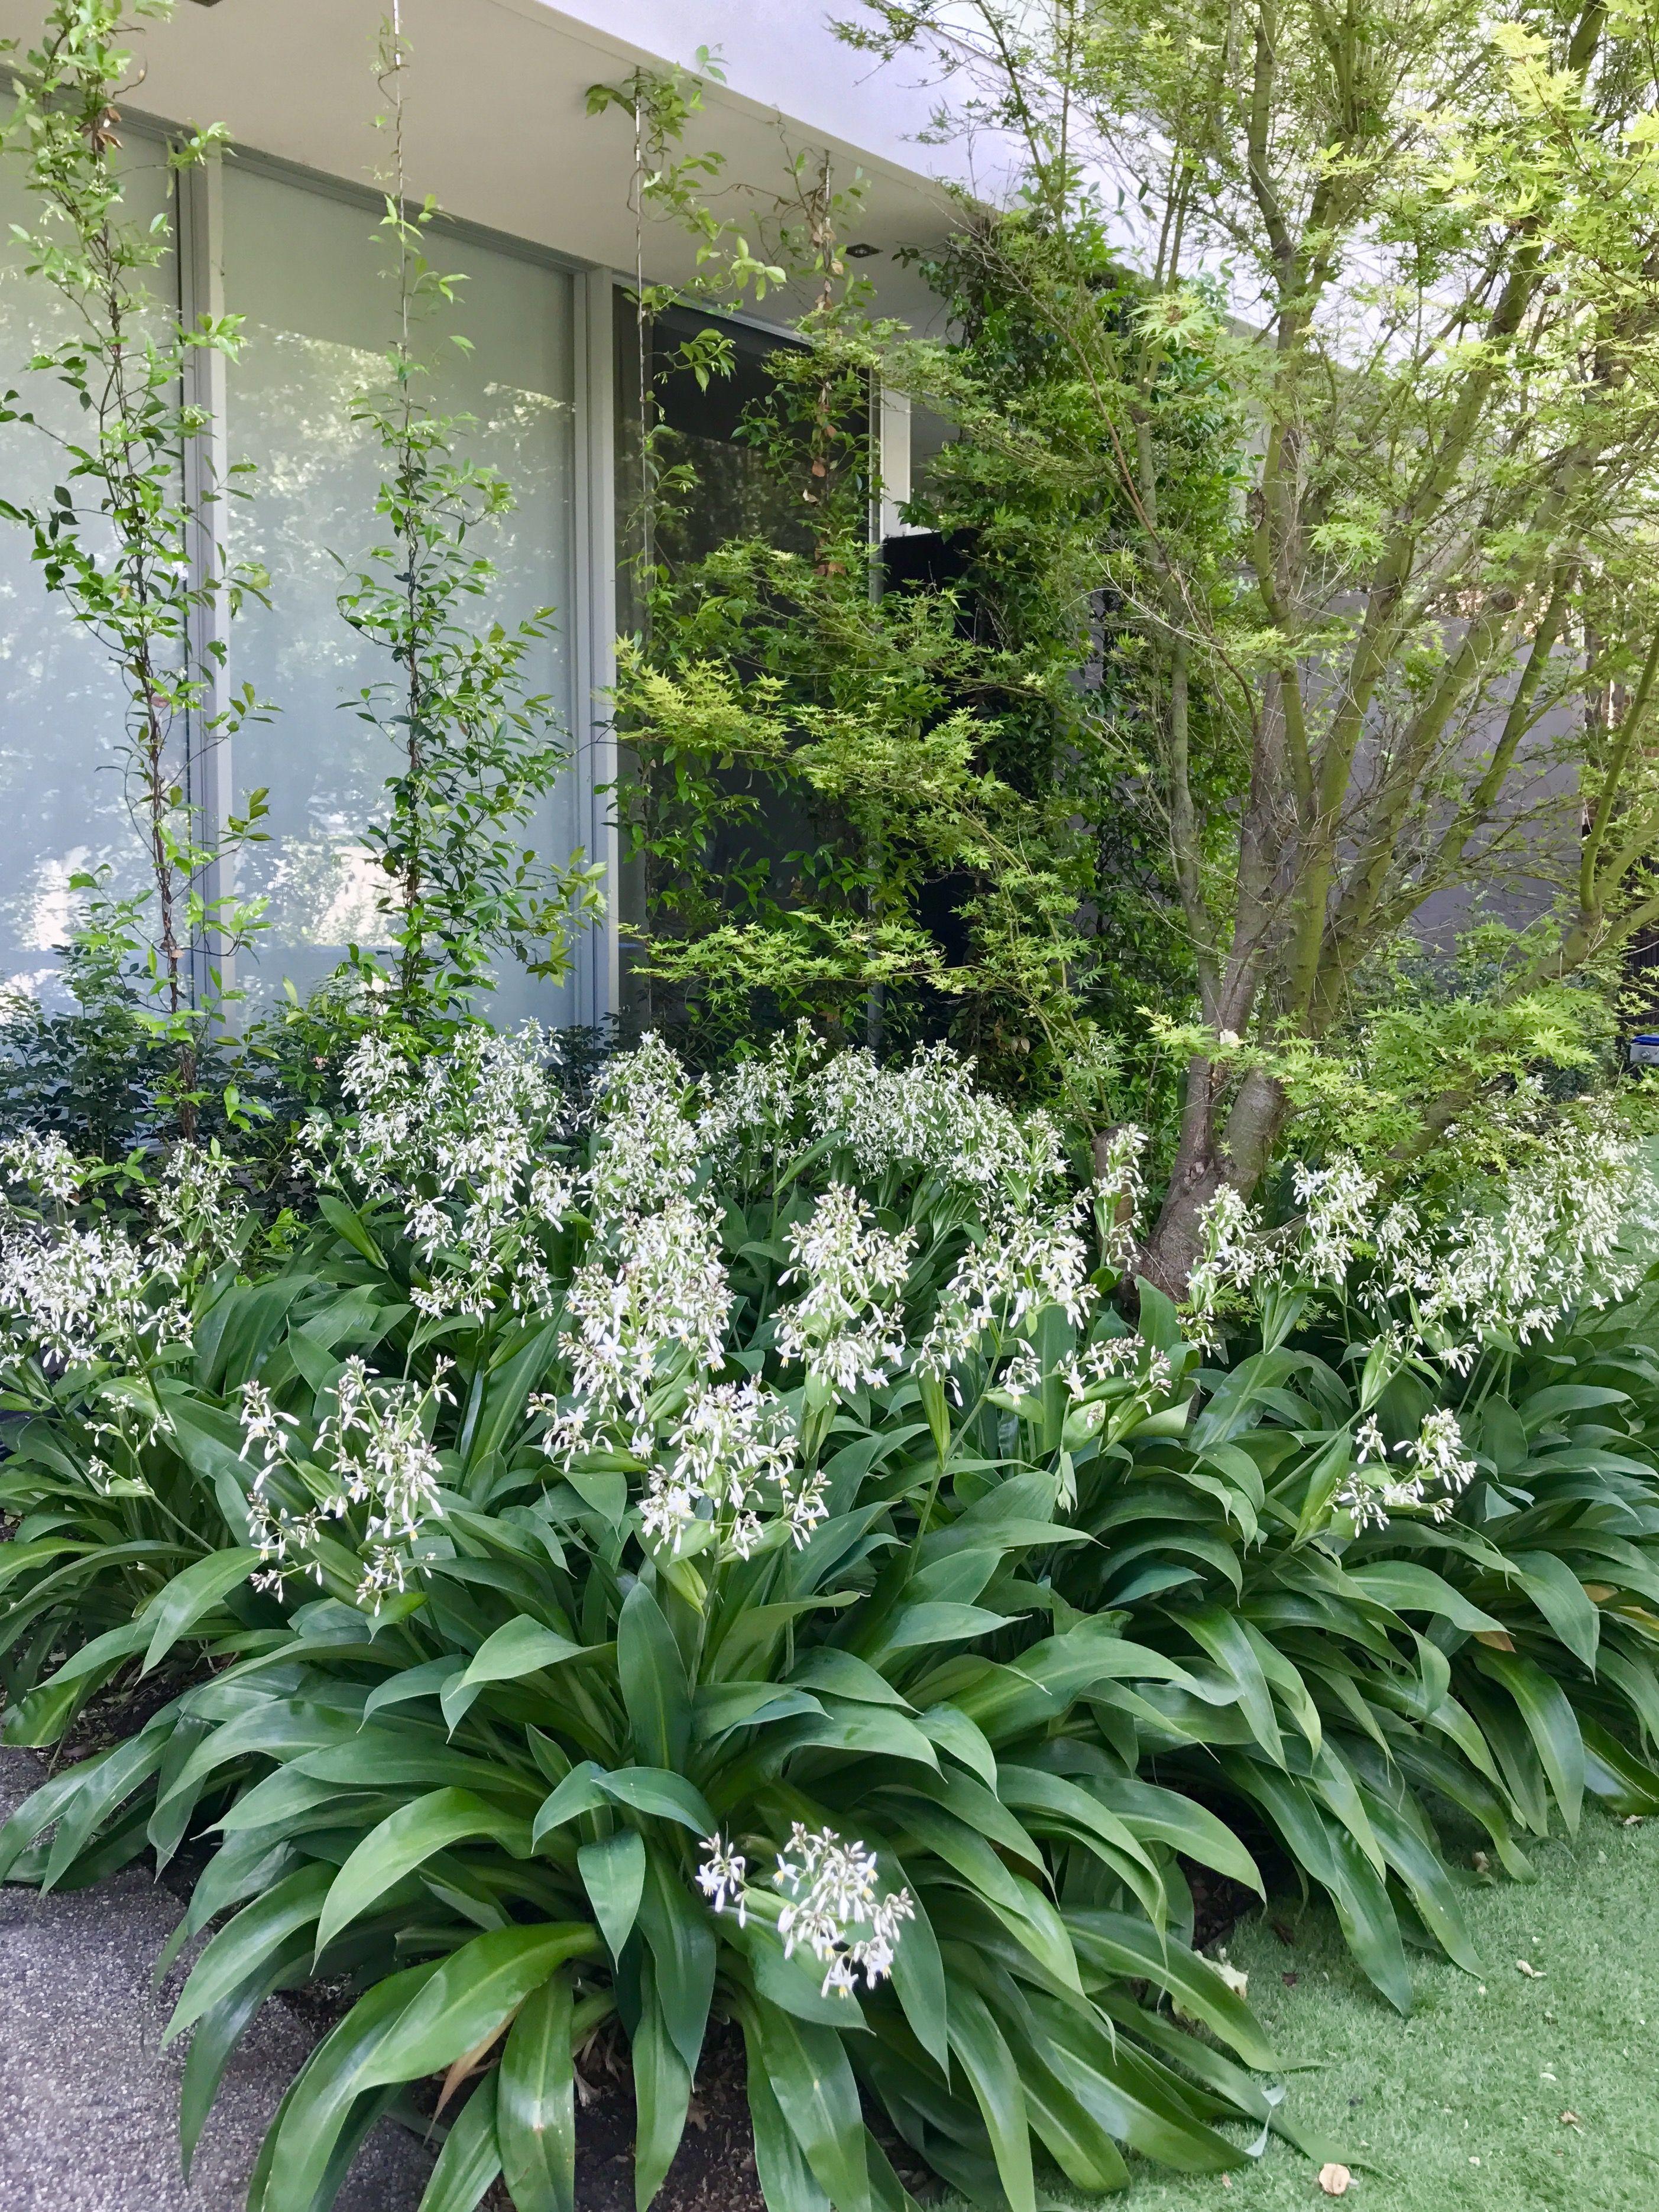 NZ Rock Lily Arthropodium Nadia Gill Landscape Architect